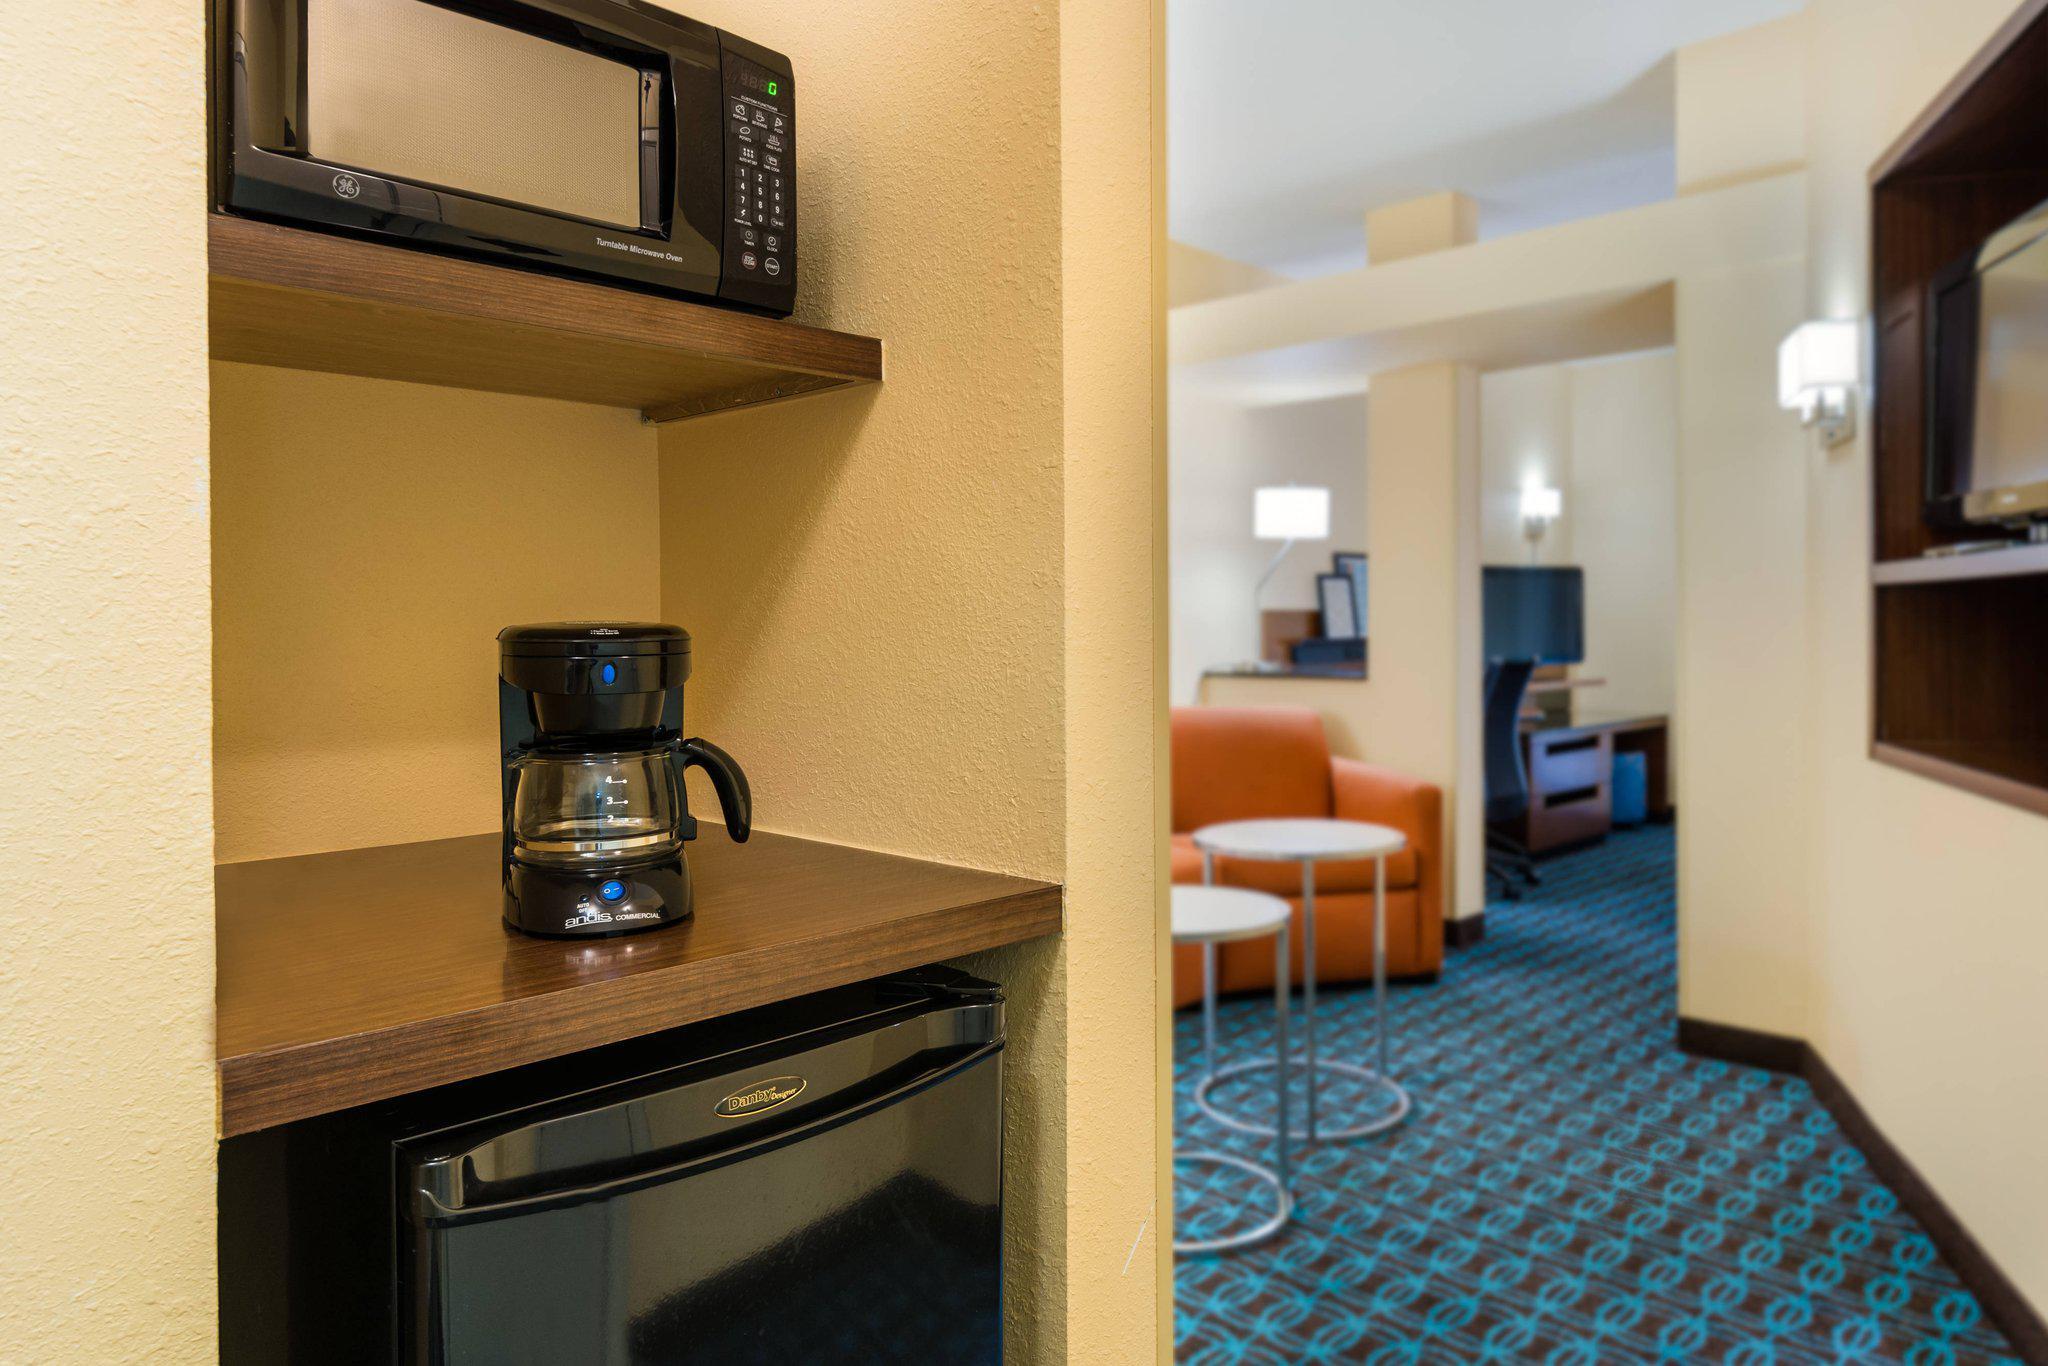 Fairfield Inn & Suites by Marriott Clearwater in Clearwater, FL, photo #18